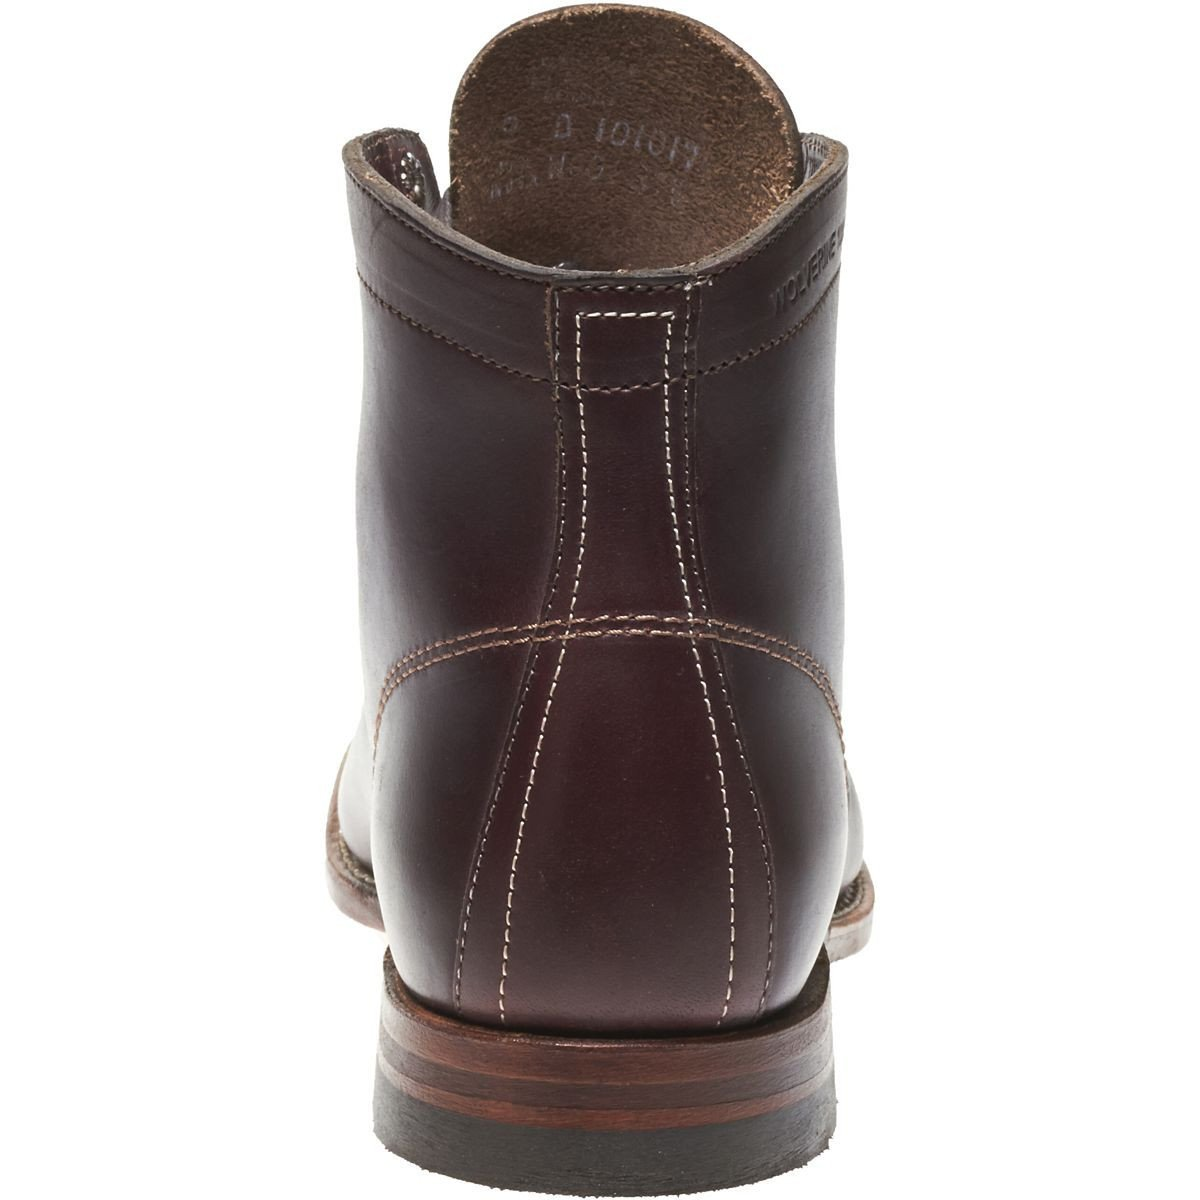 8 Leather 12 Wolverine Heritage Original 1000 Mile 6 Boot Cordovan No